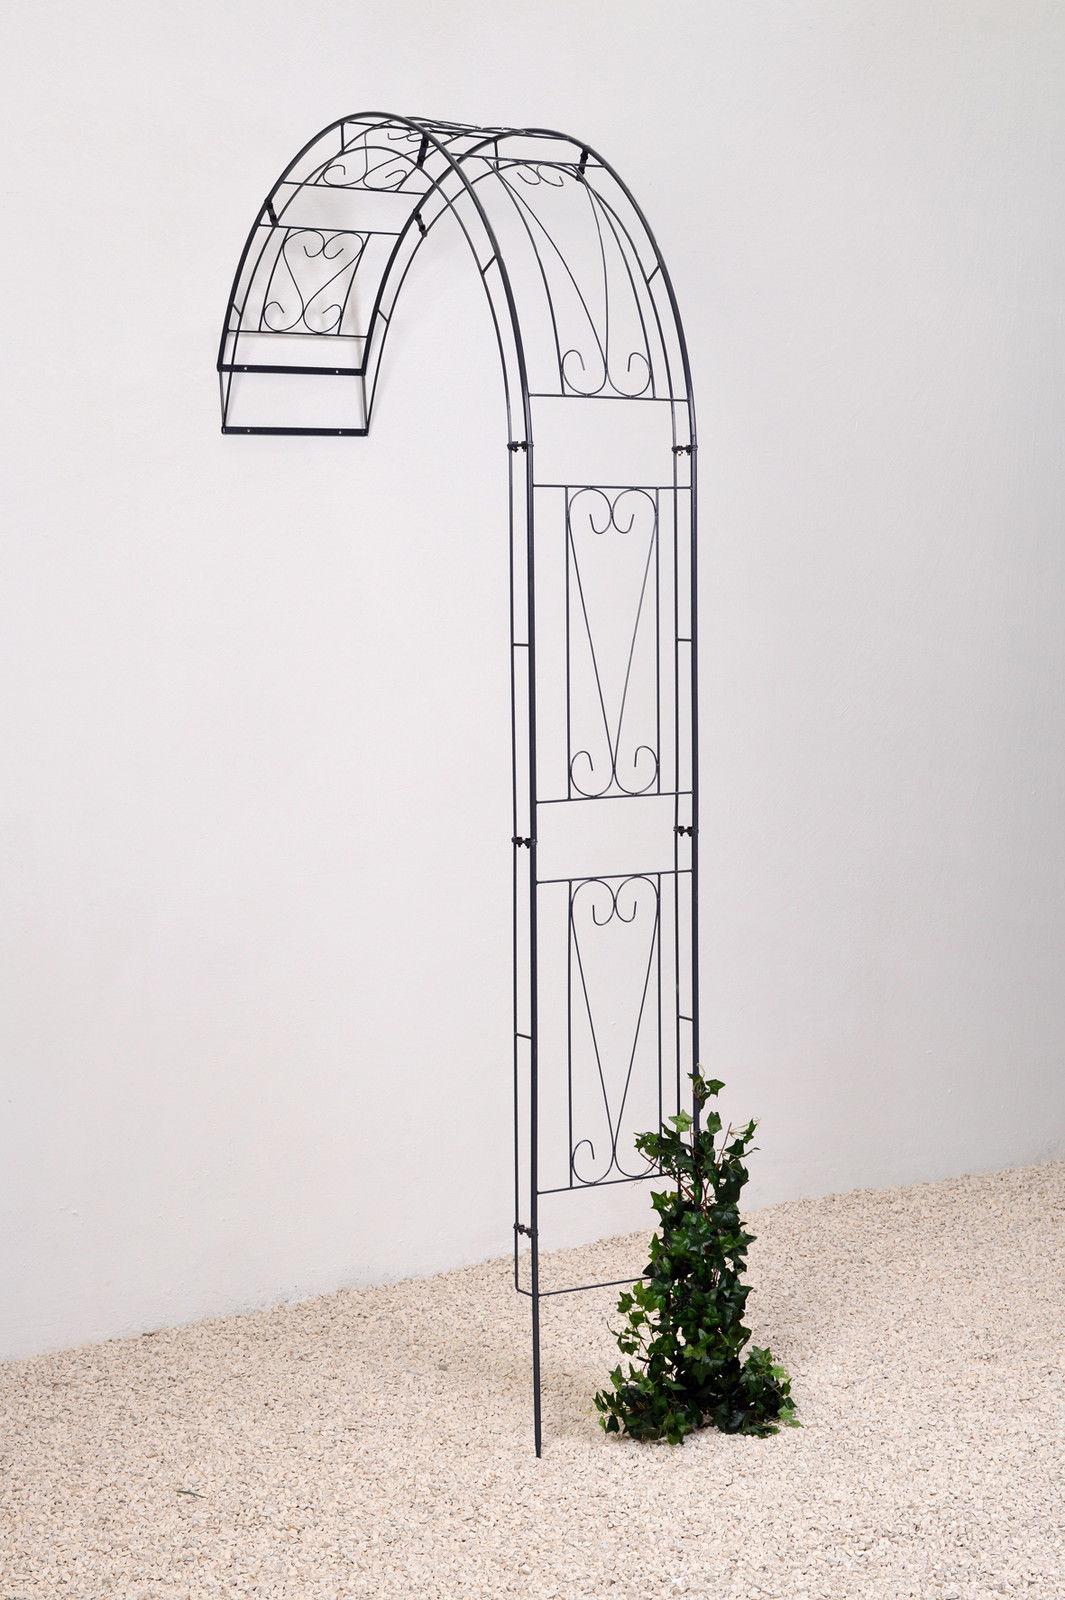 wandrosenbogen laubengang rankhilfe baccara metall. Black Bedroom Furniture Sets. Home Design Ideas